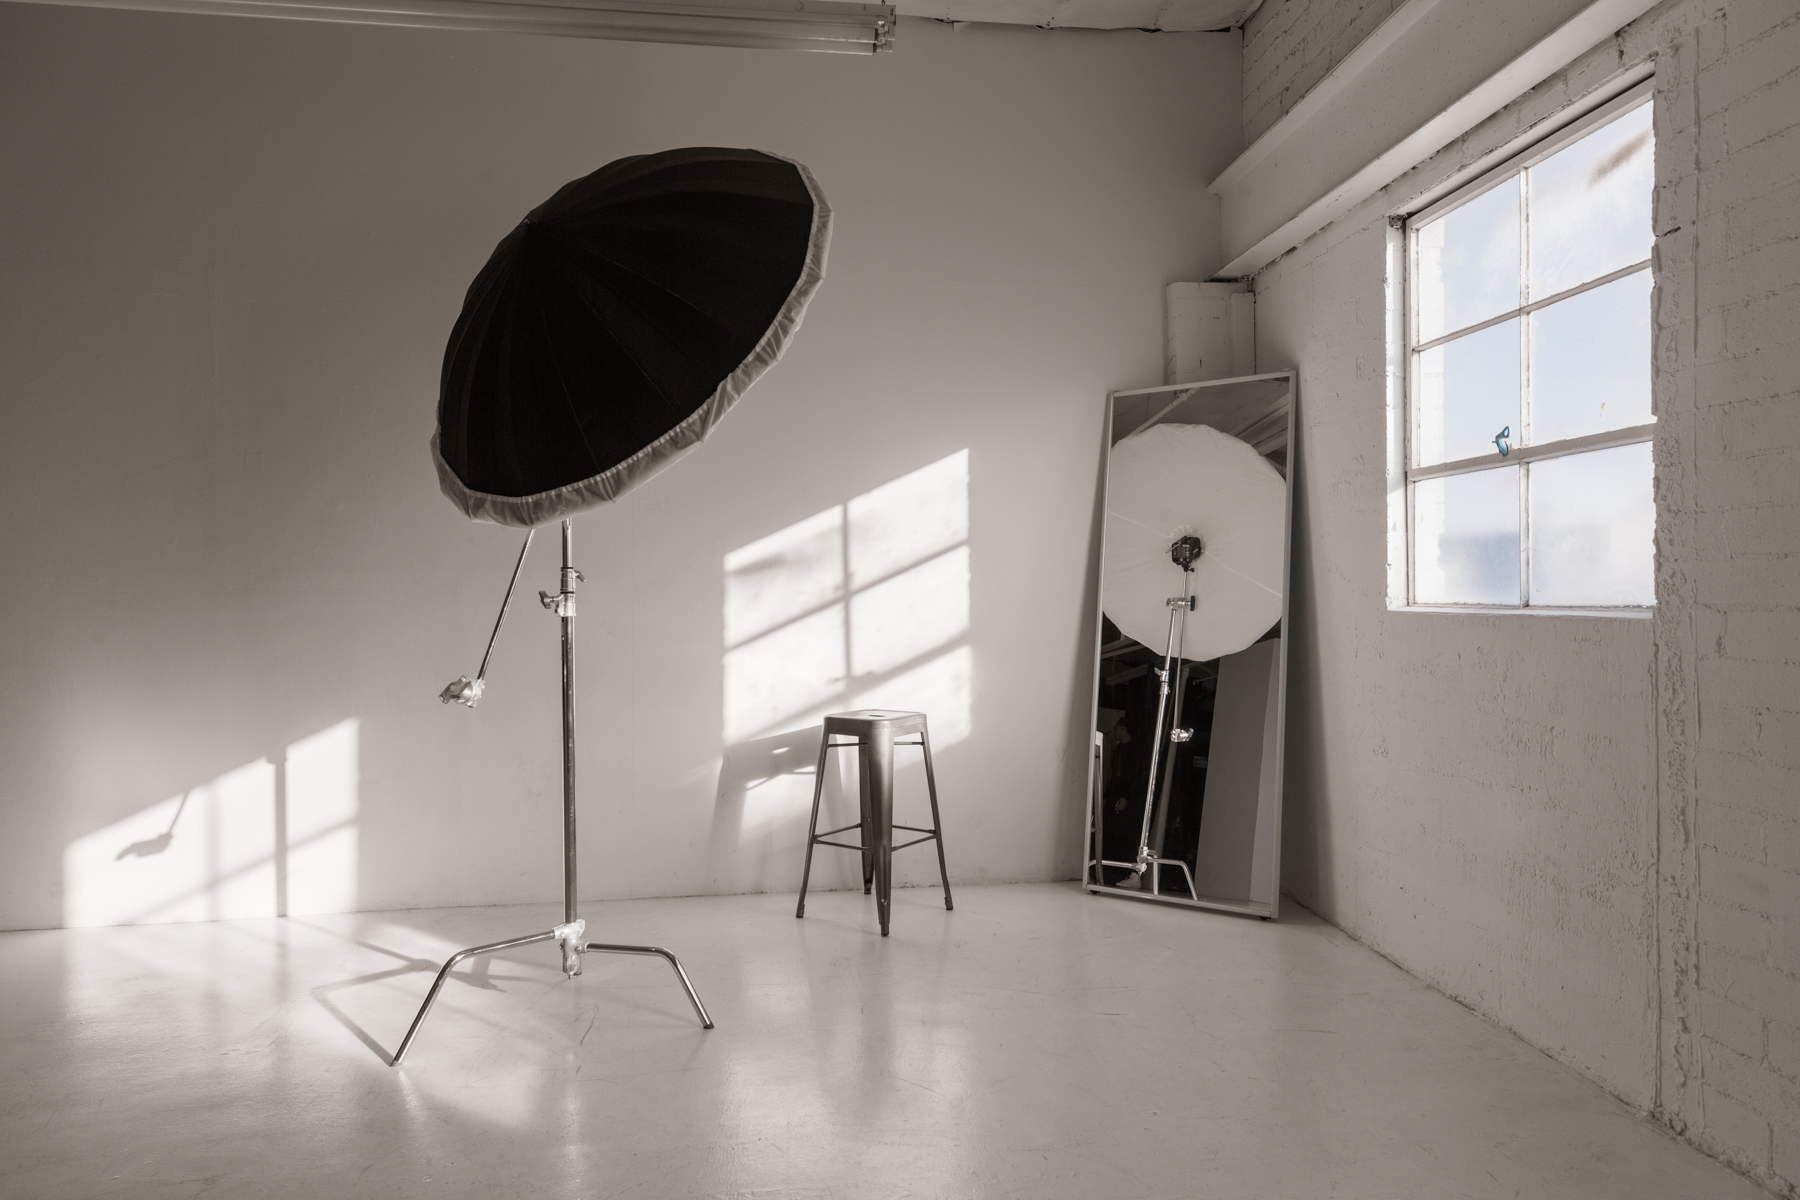 Phoenix_Commercial_Photographer-9.jpg